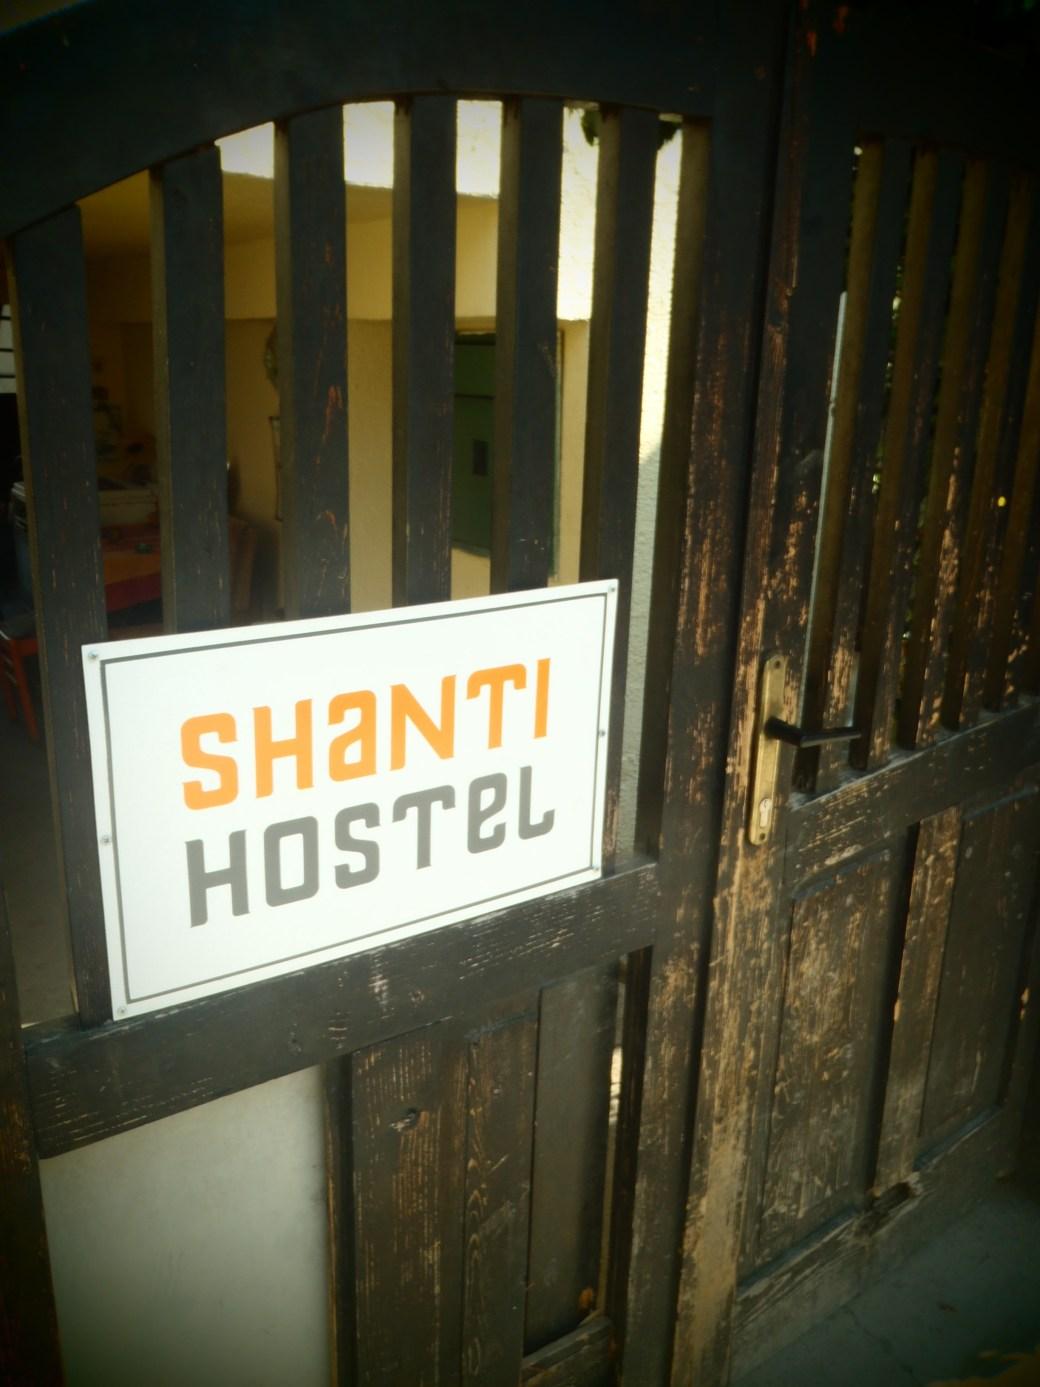 Shanti Hostel Entrance; Skopje, Republic of Macedonia; 2013